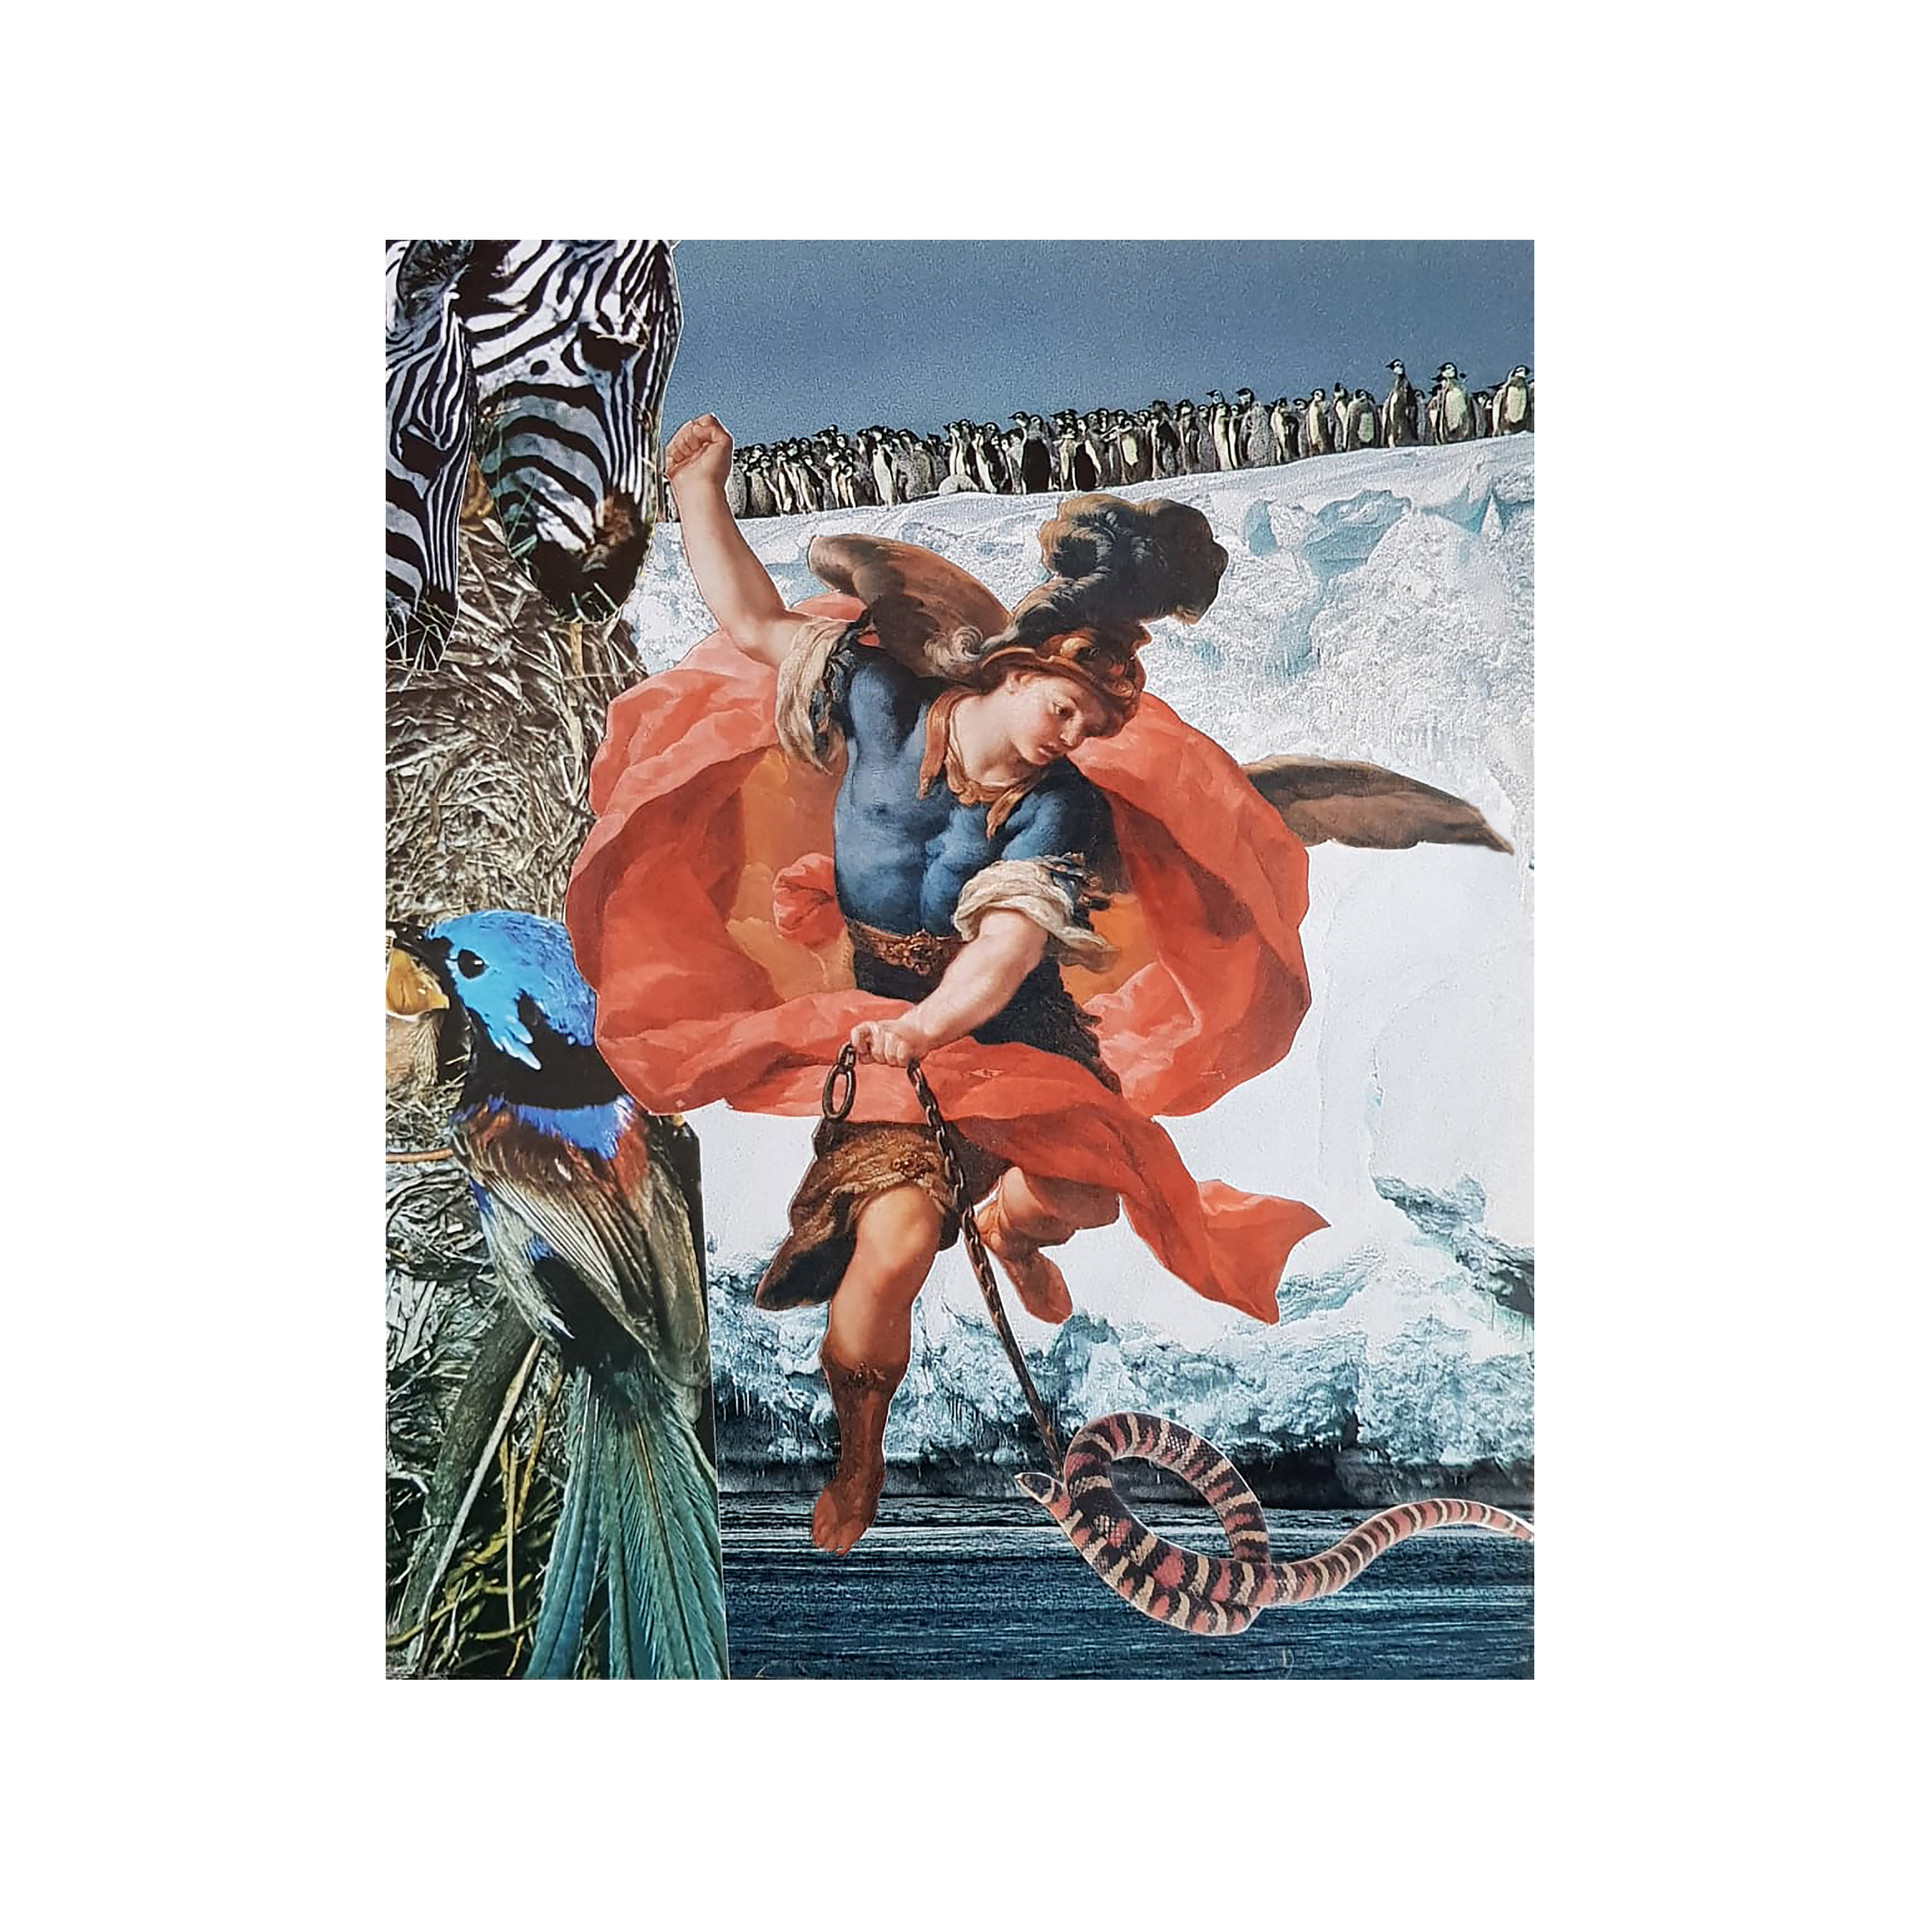 Arcangel - El Recreo Collage